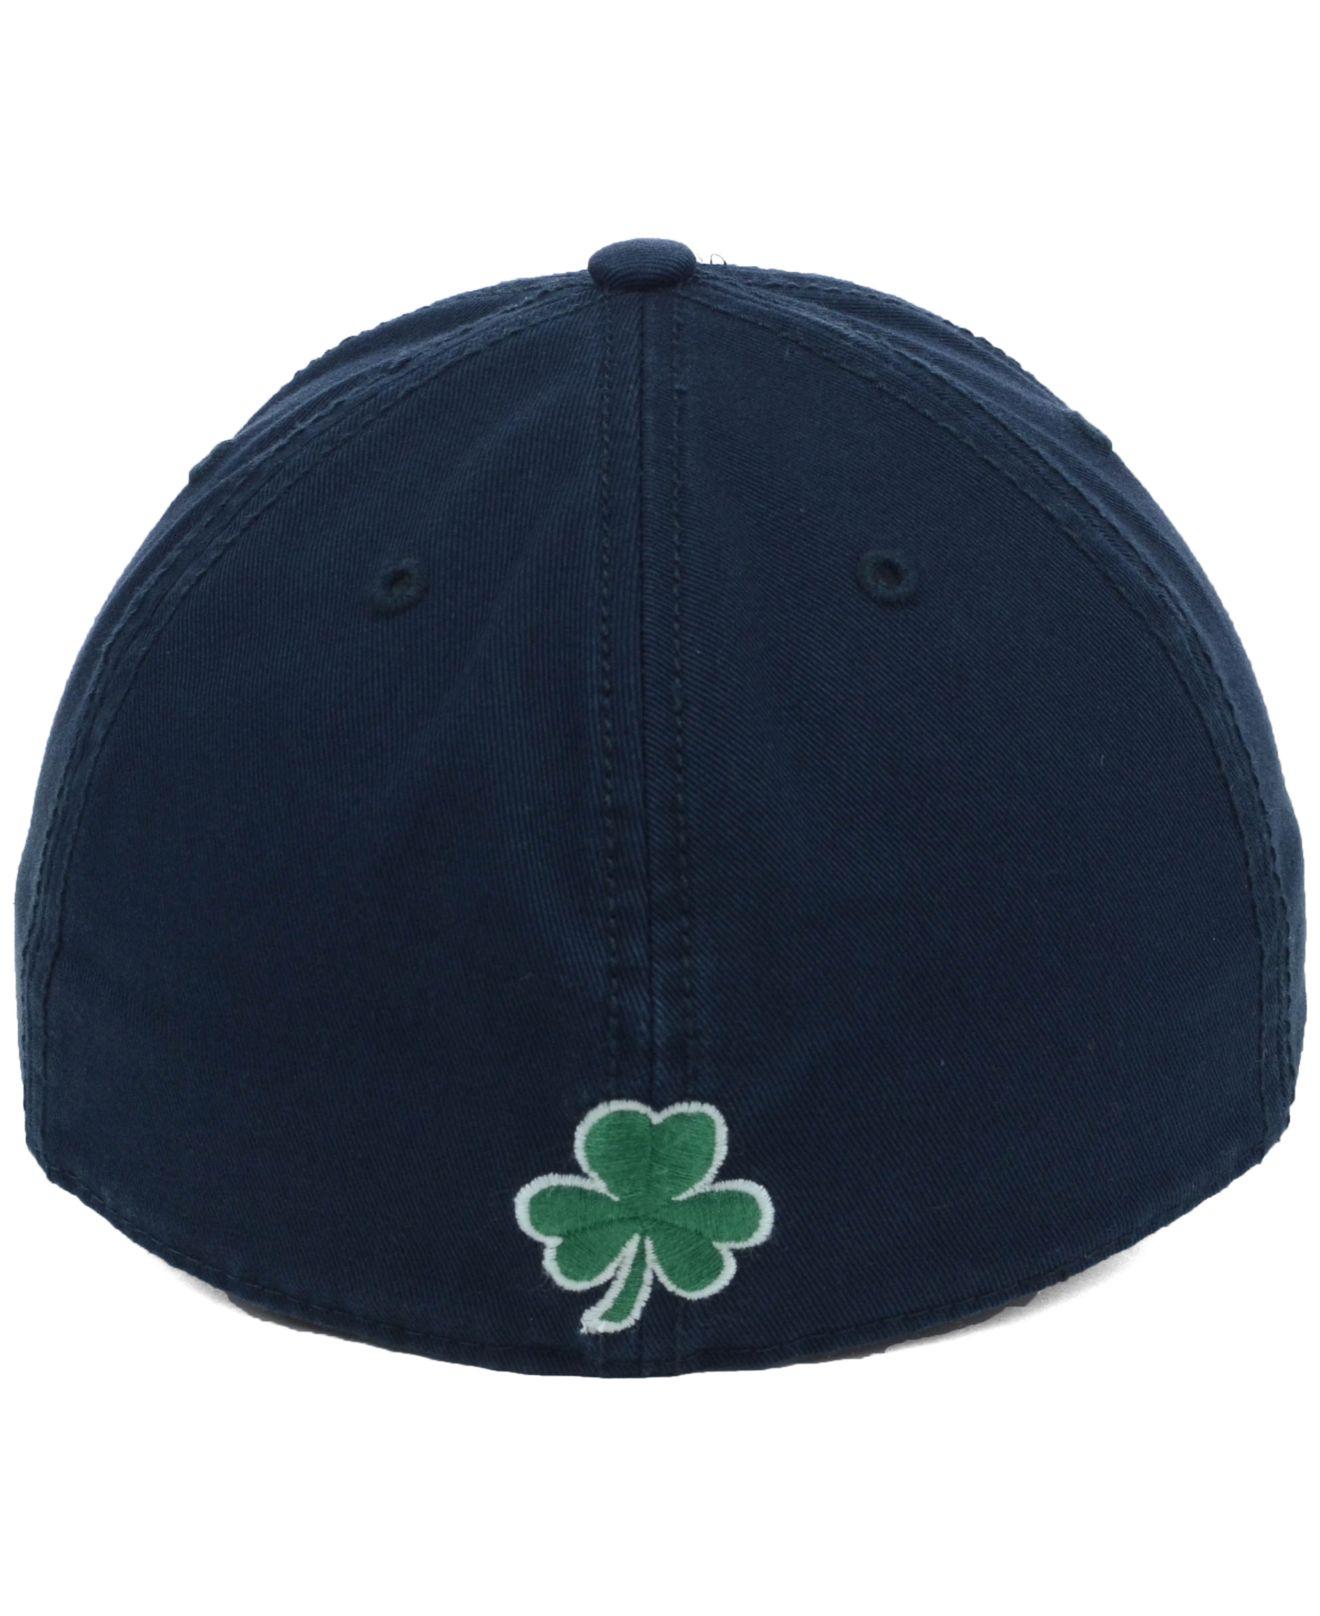 254da258b6264 ... usa lyst 47 brand detroit tigers mlb dublin cap in blue for men 5291d  85c3f